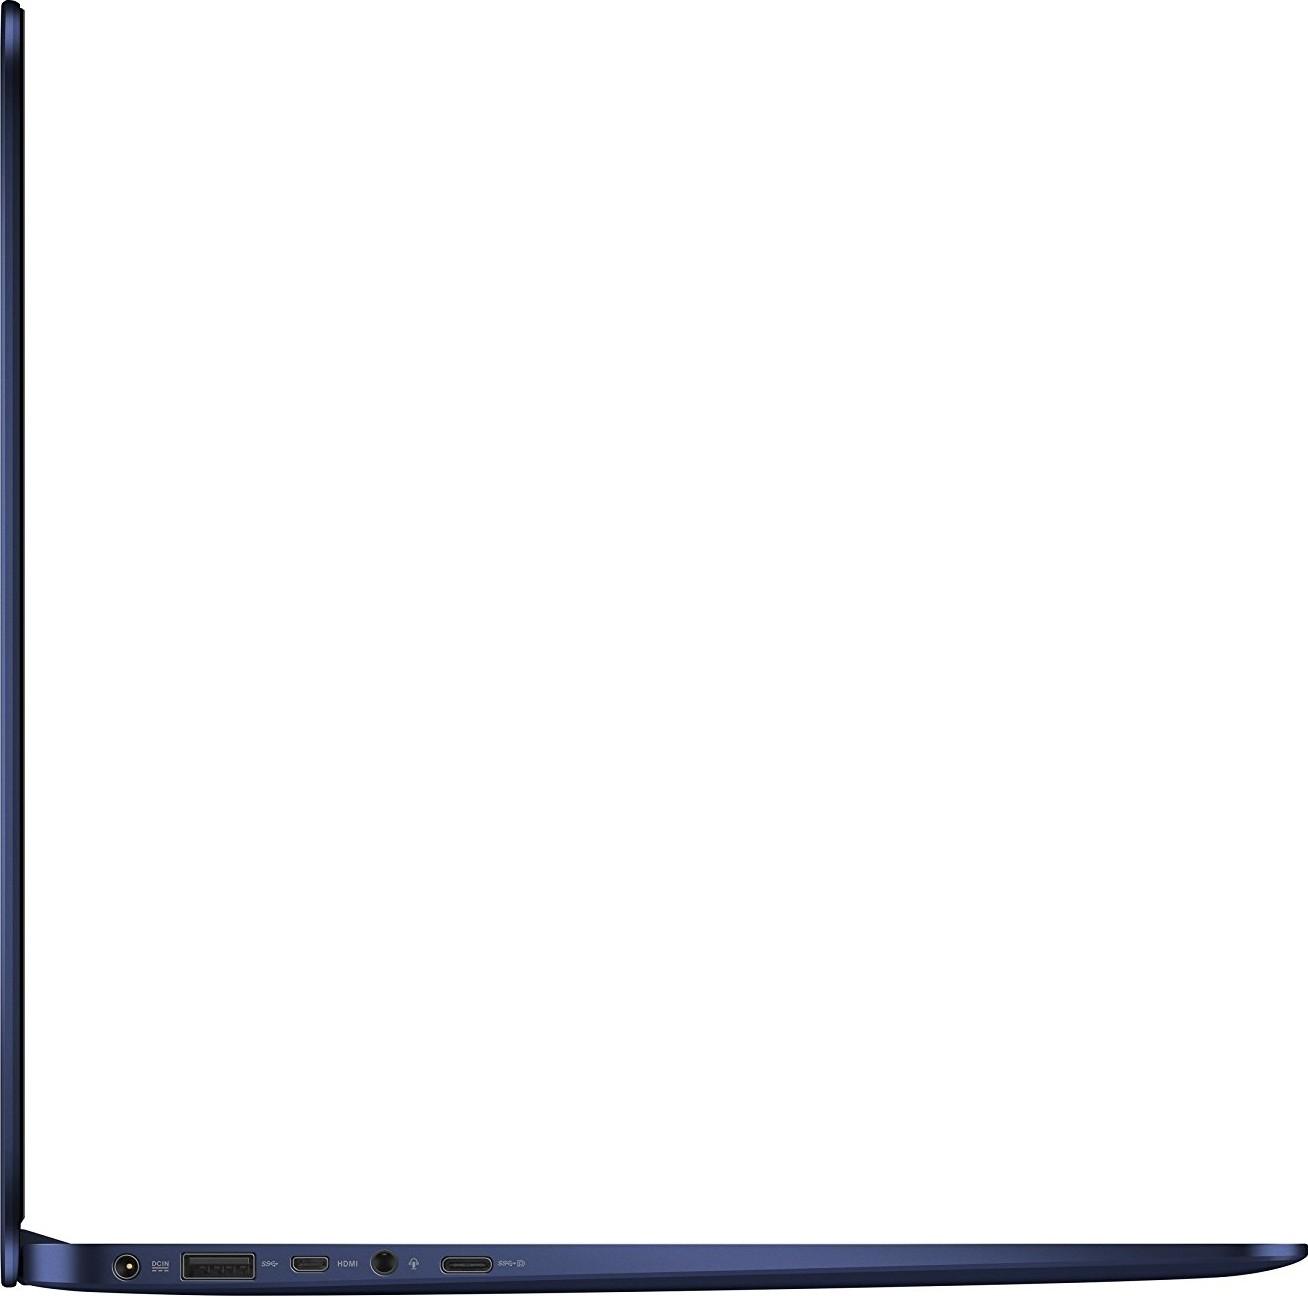 Asus ZenBook UX430UN i7 8550U 1 8GHz, 8GB RAM, 512 SSD, 14 Full HD, 2GB  NVIDIA GeForce, Bluetooth